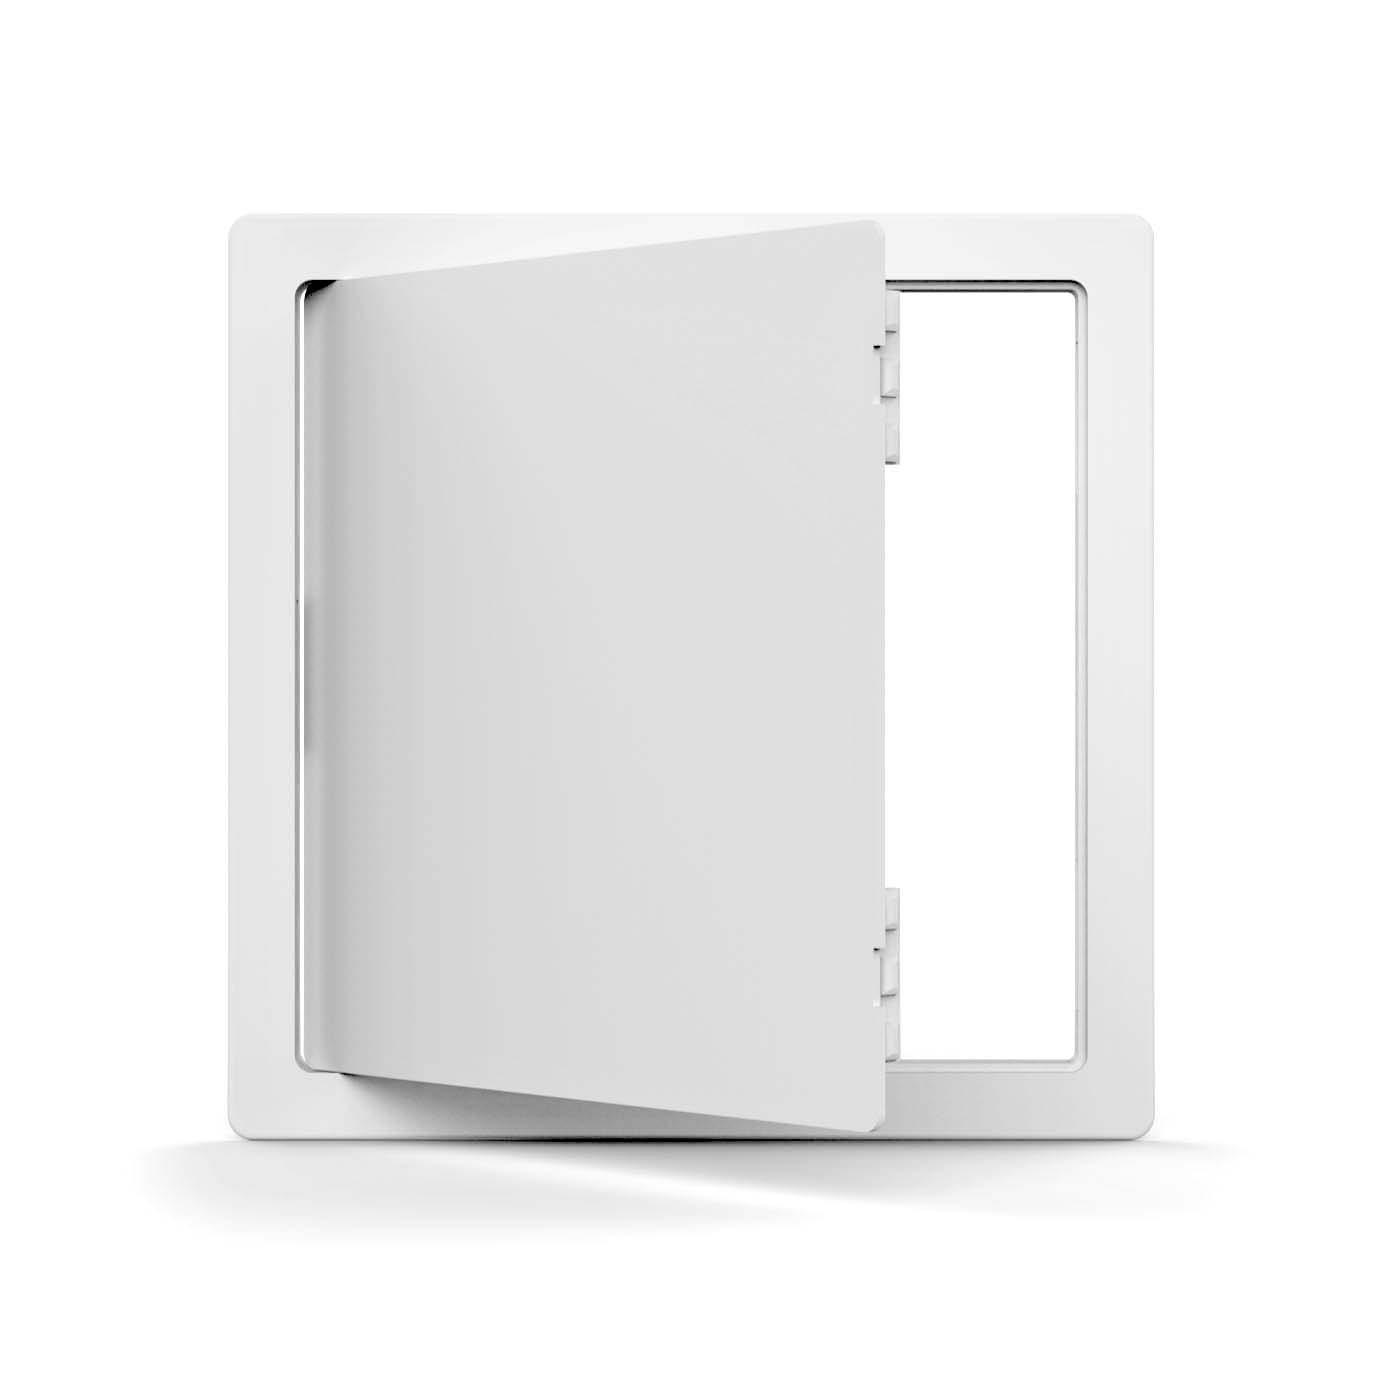 Acudor PA1212 Pa-3000 Plastic Access Door 12x12, Plastic, 14'' Height